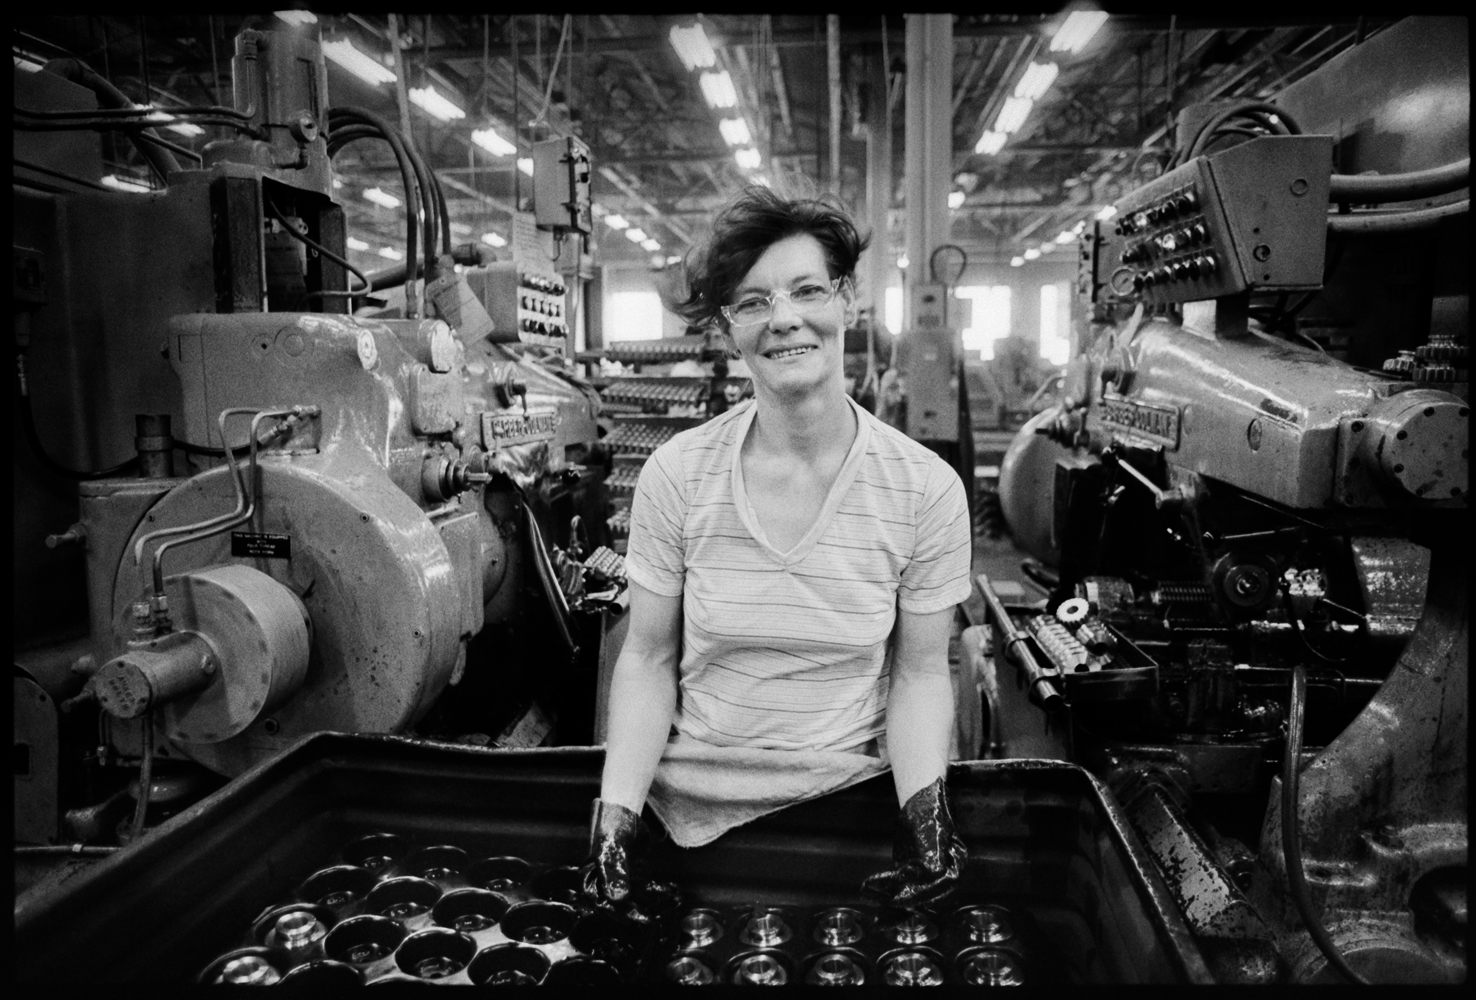 Industrial labor